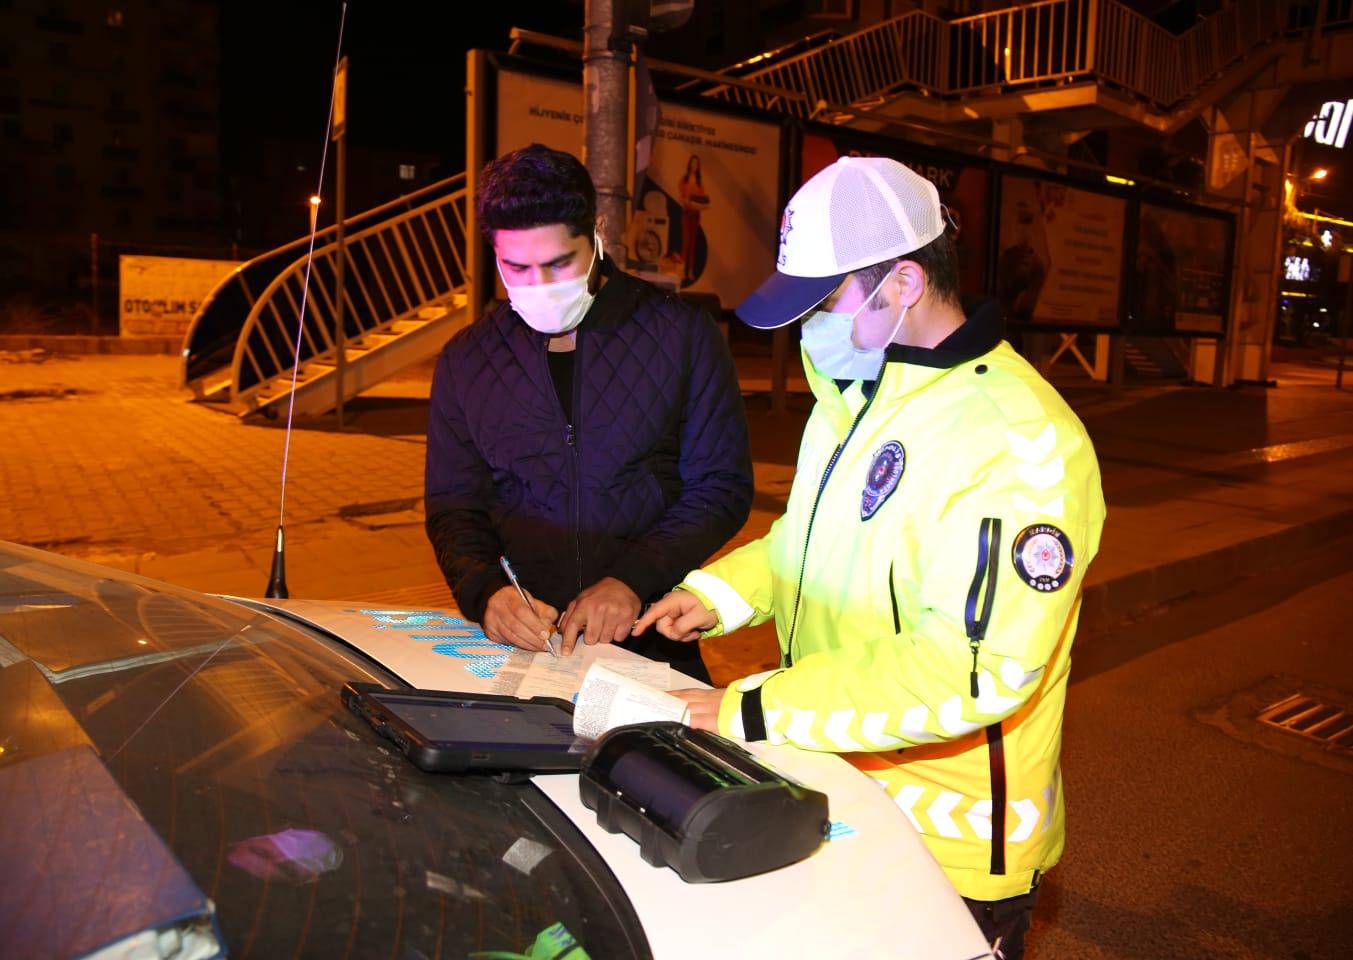 Mardin'de maske takmayan 123 kişiye 110 bin 700 lira ceza kesildi